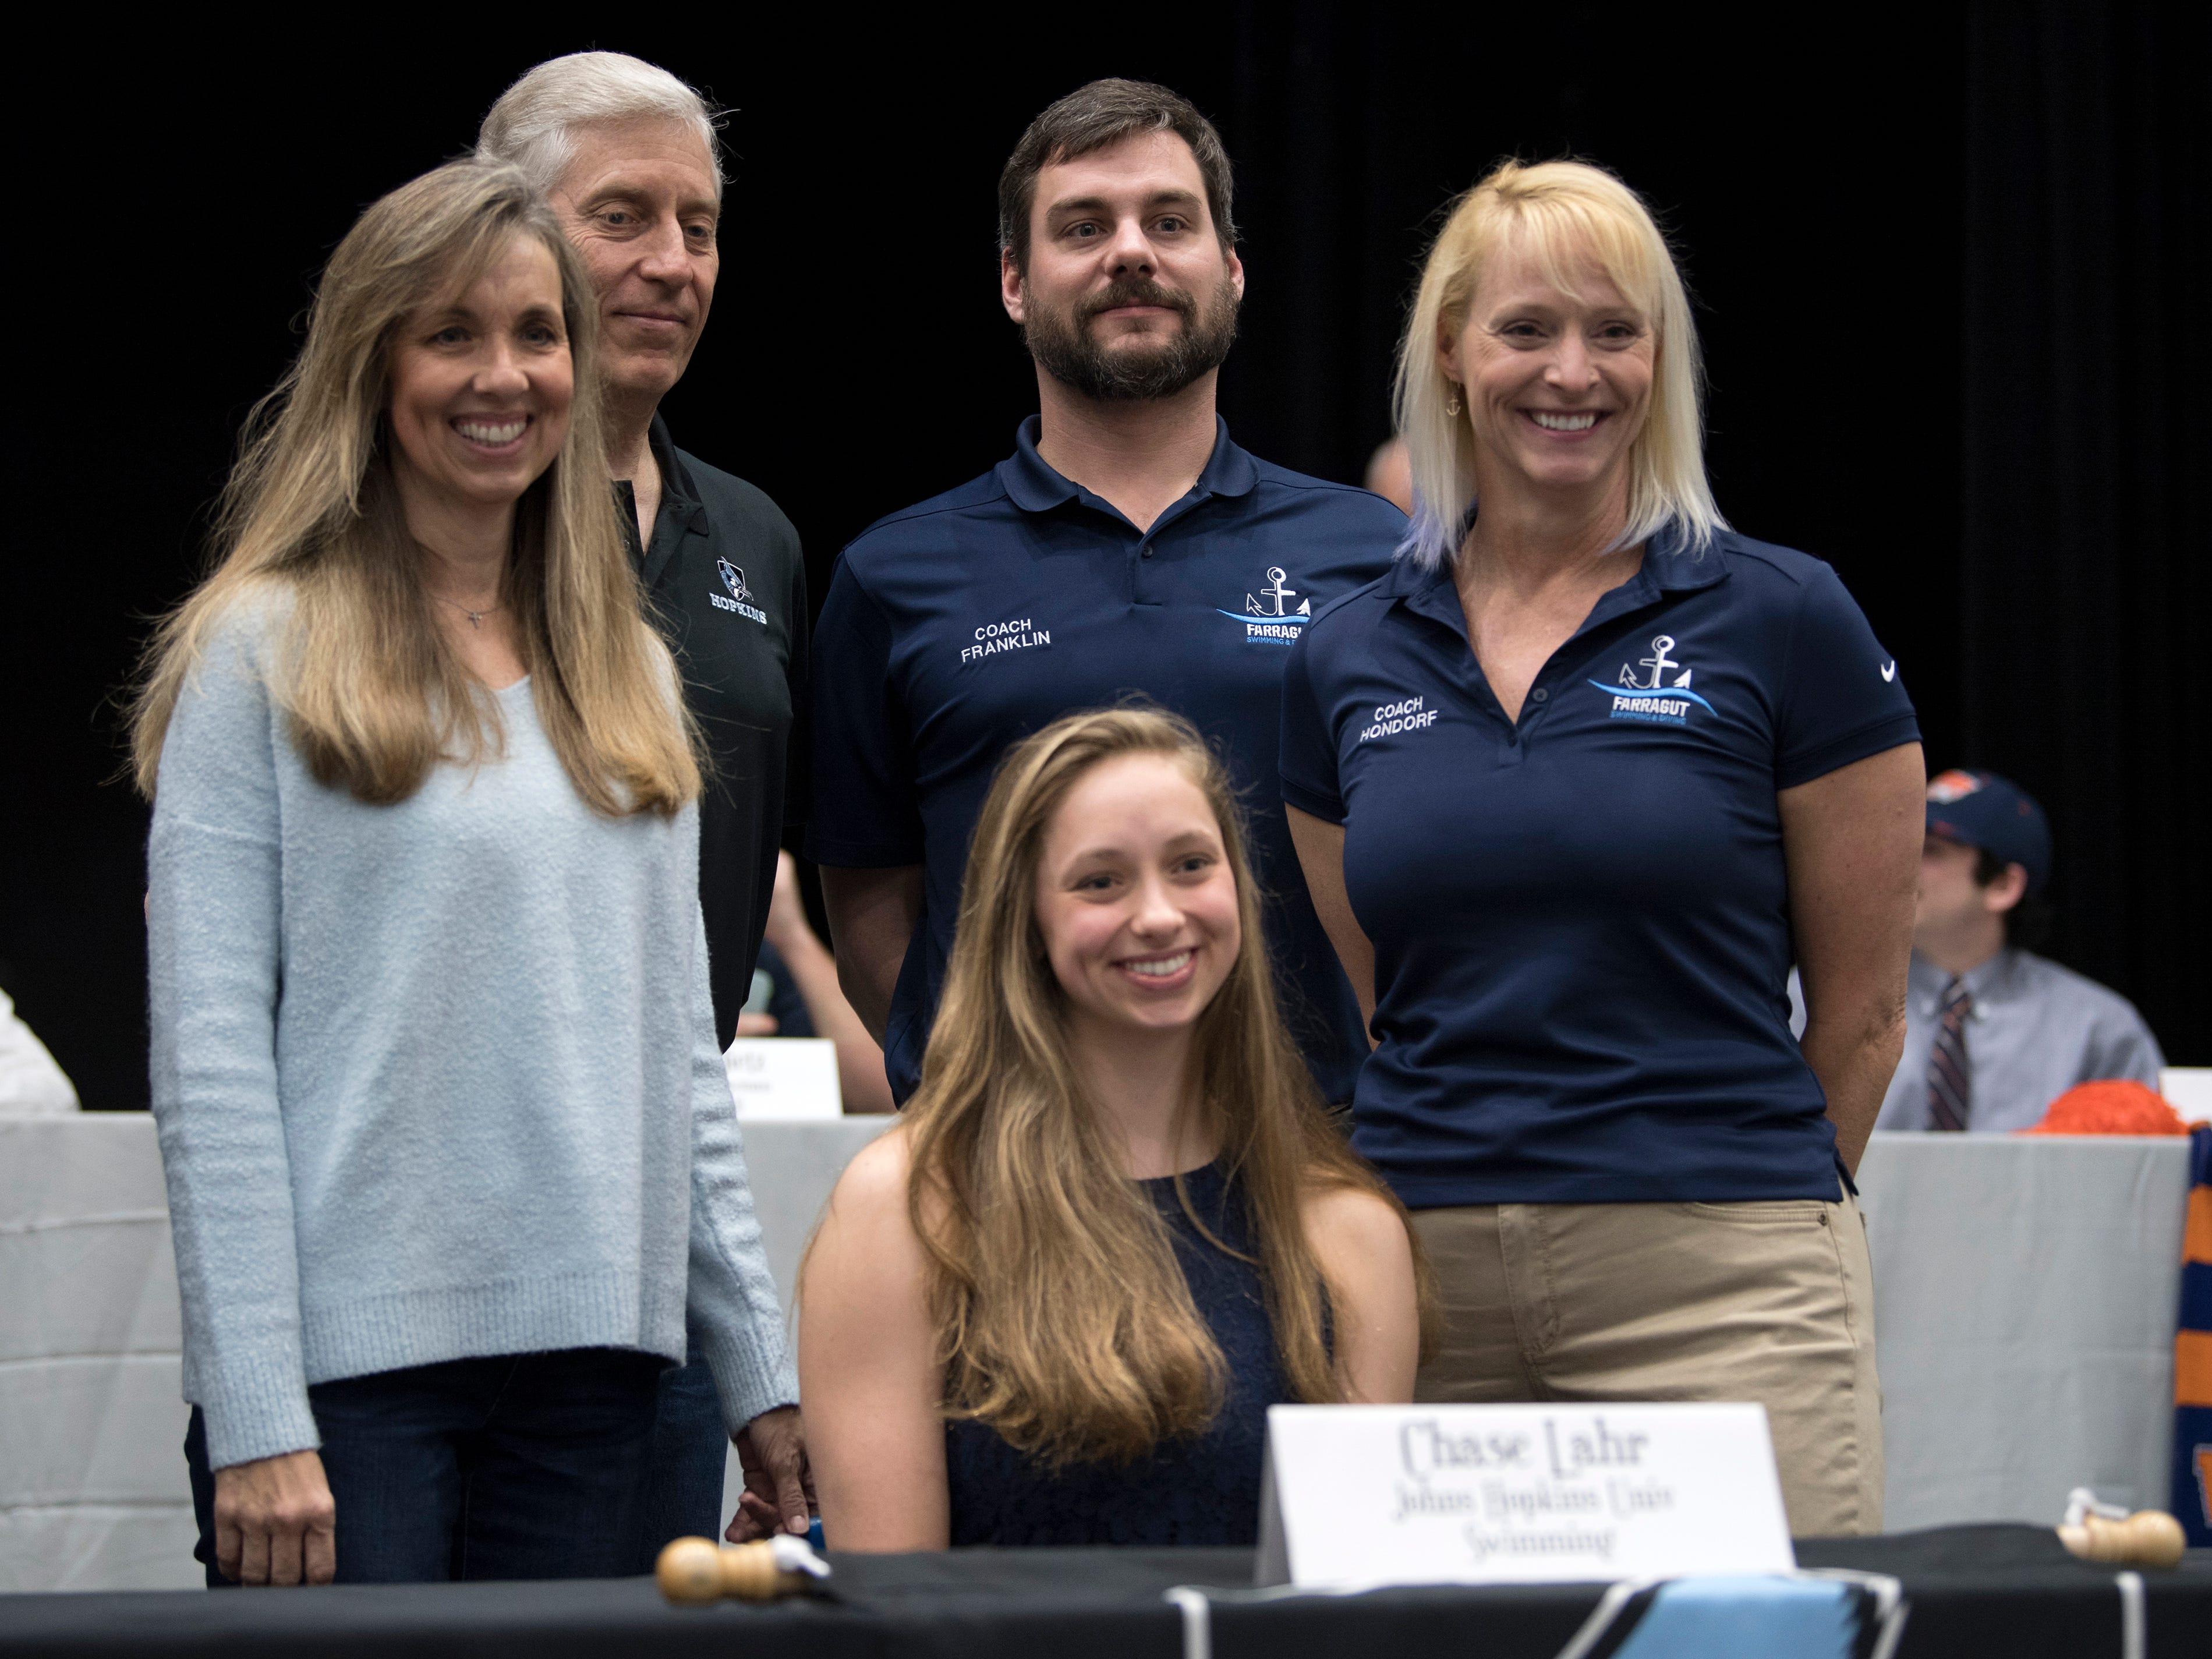 Farragut swimmer Chase Lahr signed with Johns Hopkins University.